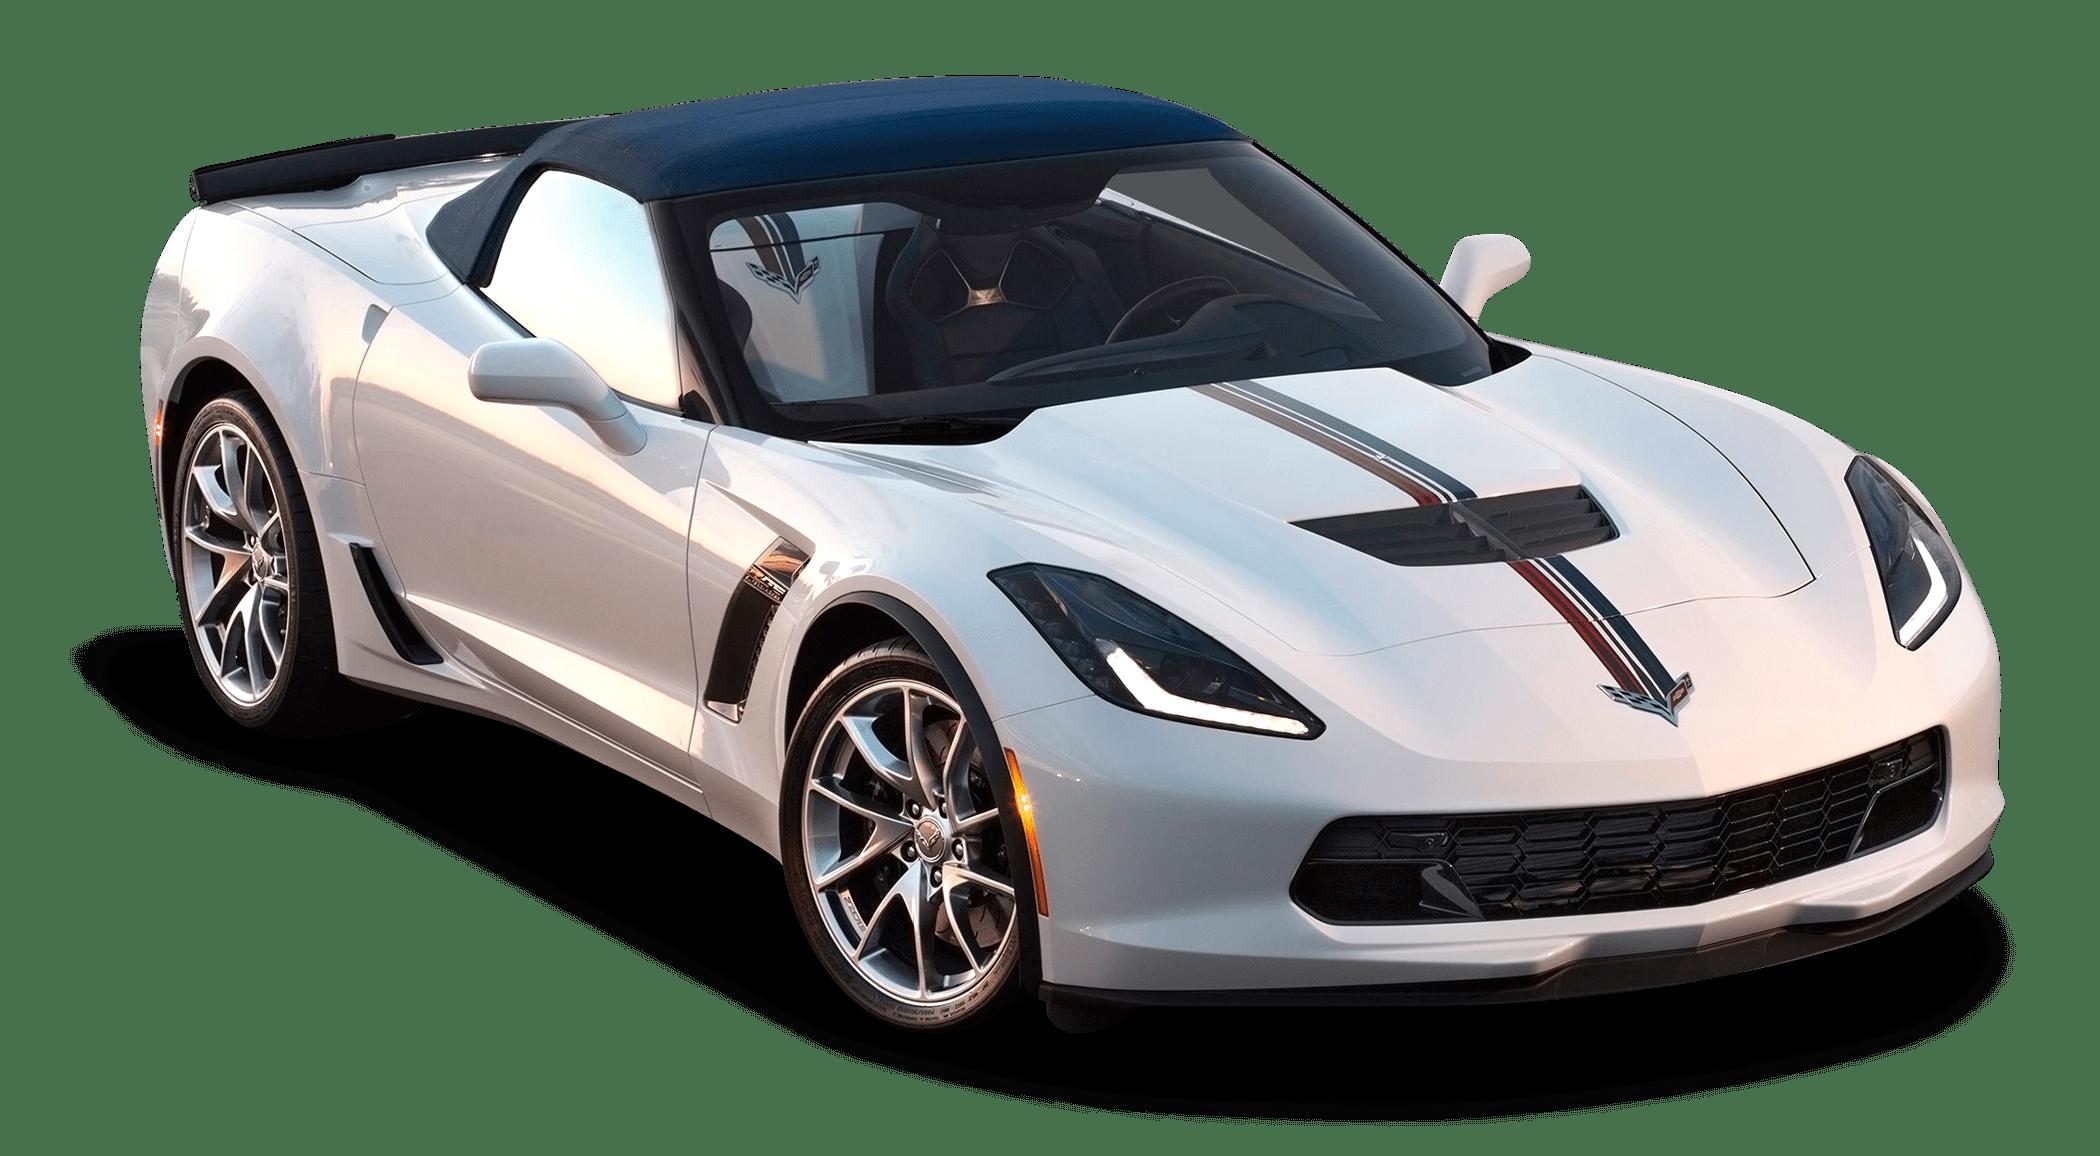 White Corvette transparent PNG.